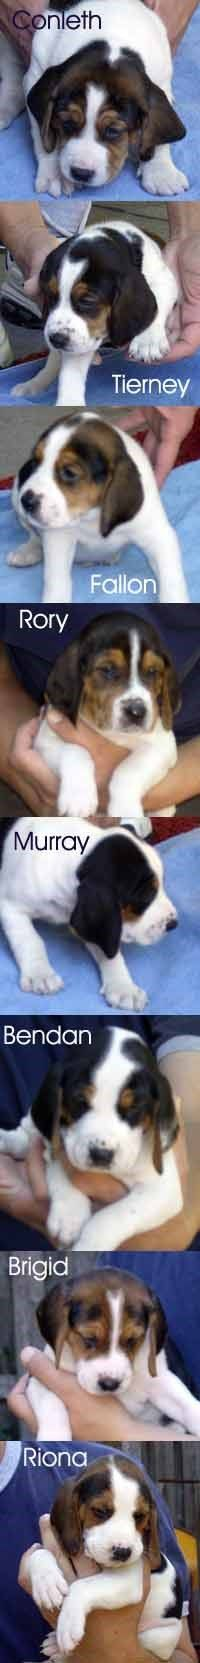 American Foxhound dog for Adoption in Chantilly, VA. ADN-542443 on PuppyFinder.com Gender: Male. Age: Adult